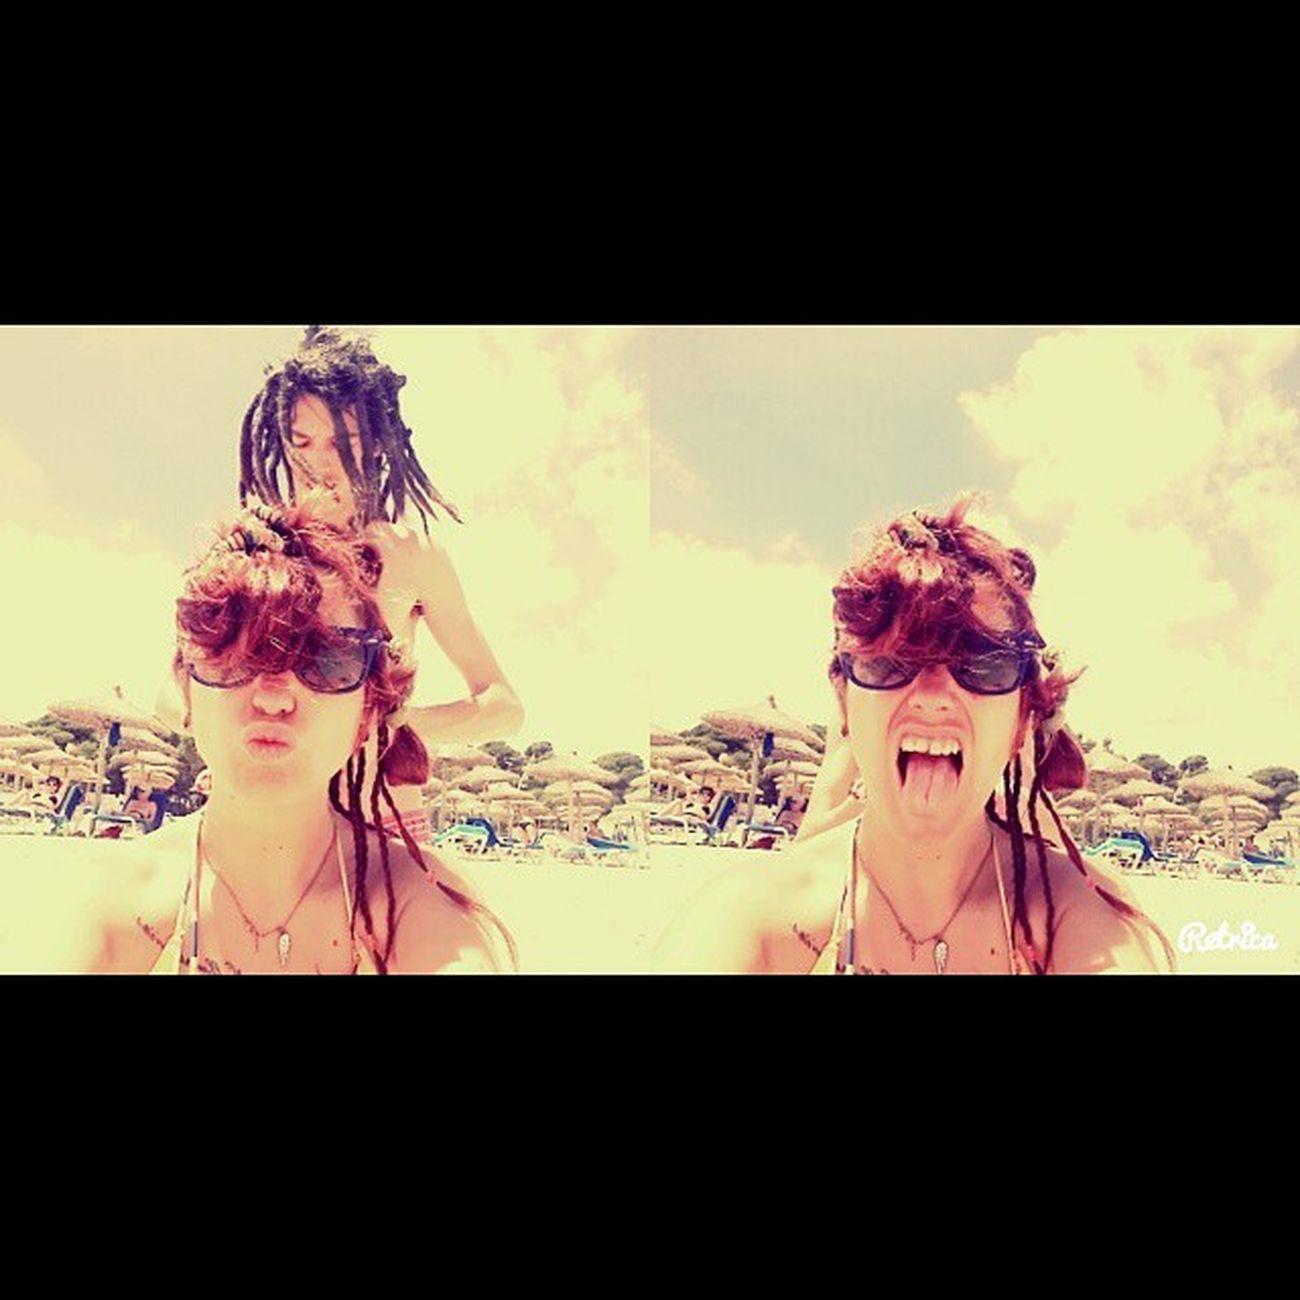 Playa Beach Santaponsa Mallorca Putoamo Trencintas Rastaman Postureo Sol Summer Lunes 1 *lunesjuntos Molamos Mucho Joral T20